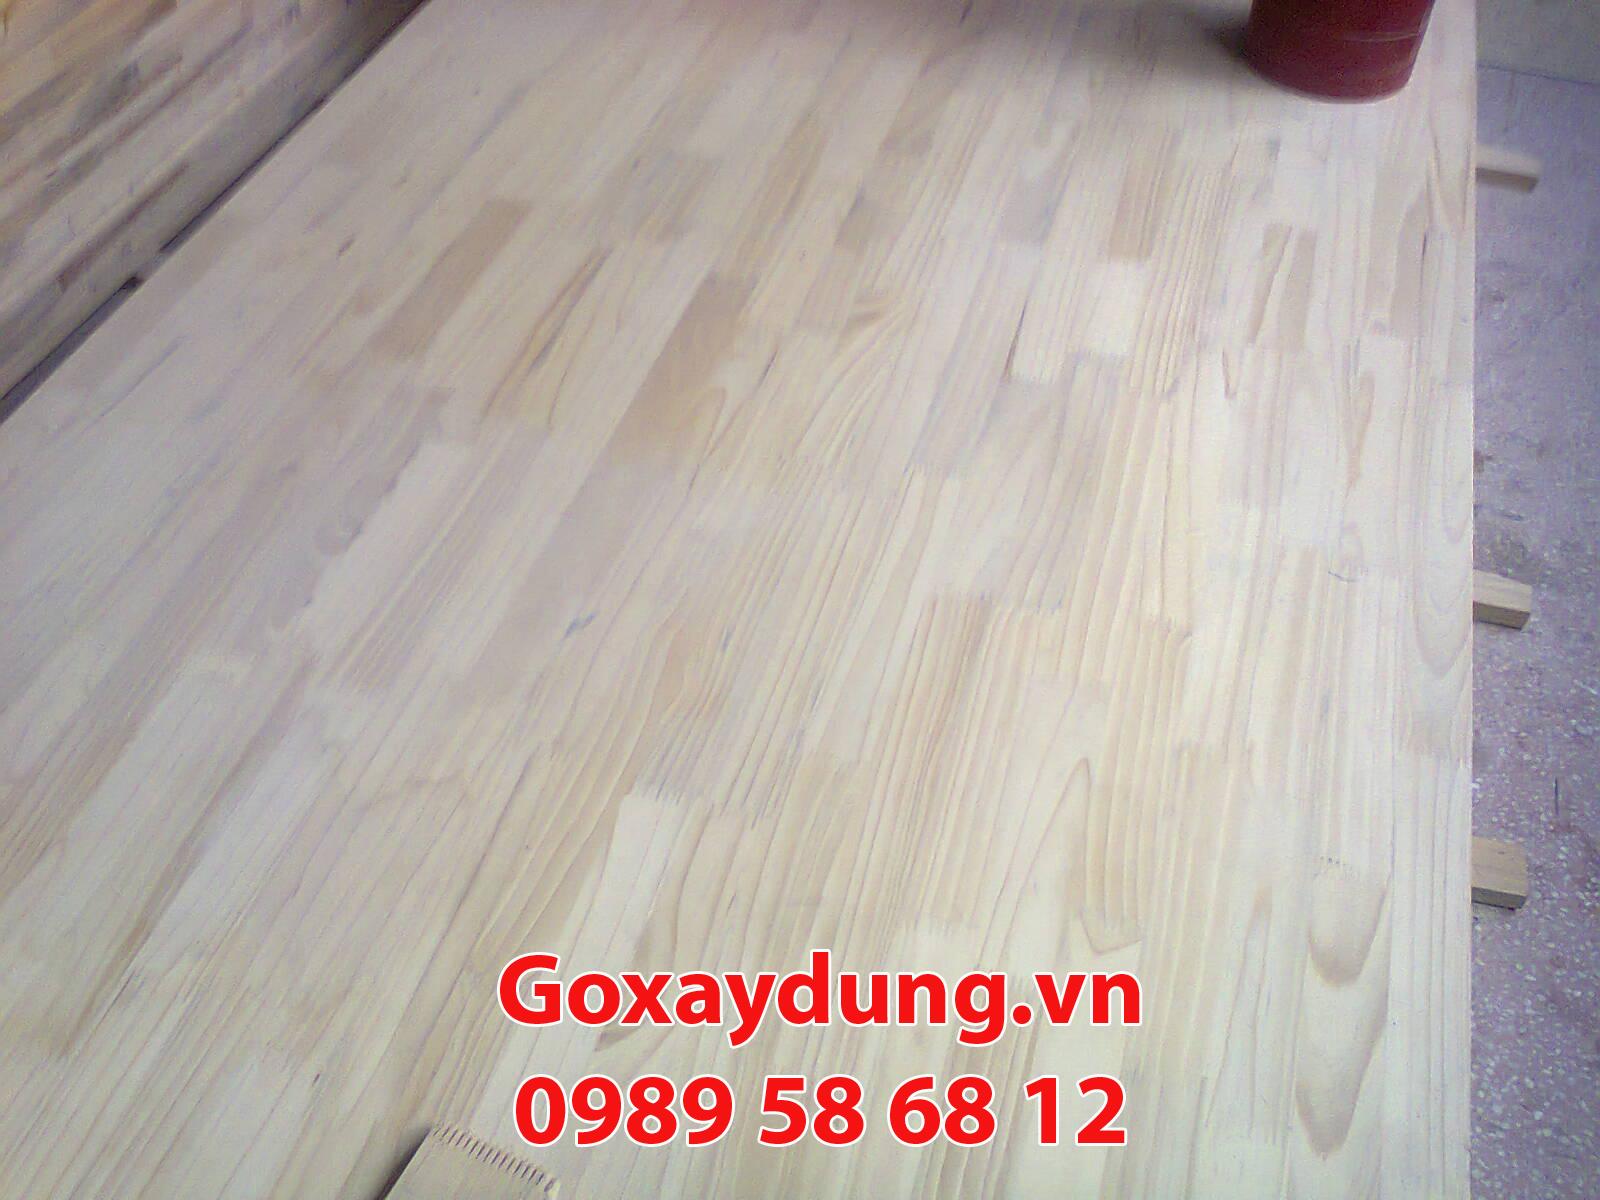 go-xaydung-go-thong-ghep-thanh-8.jpg